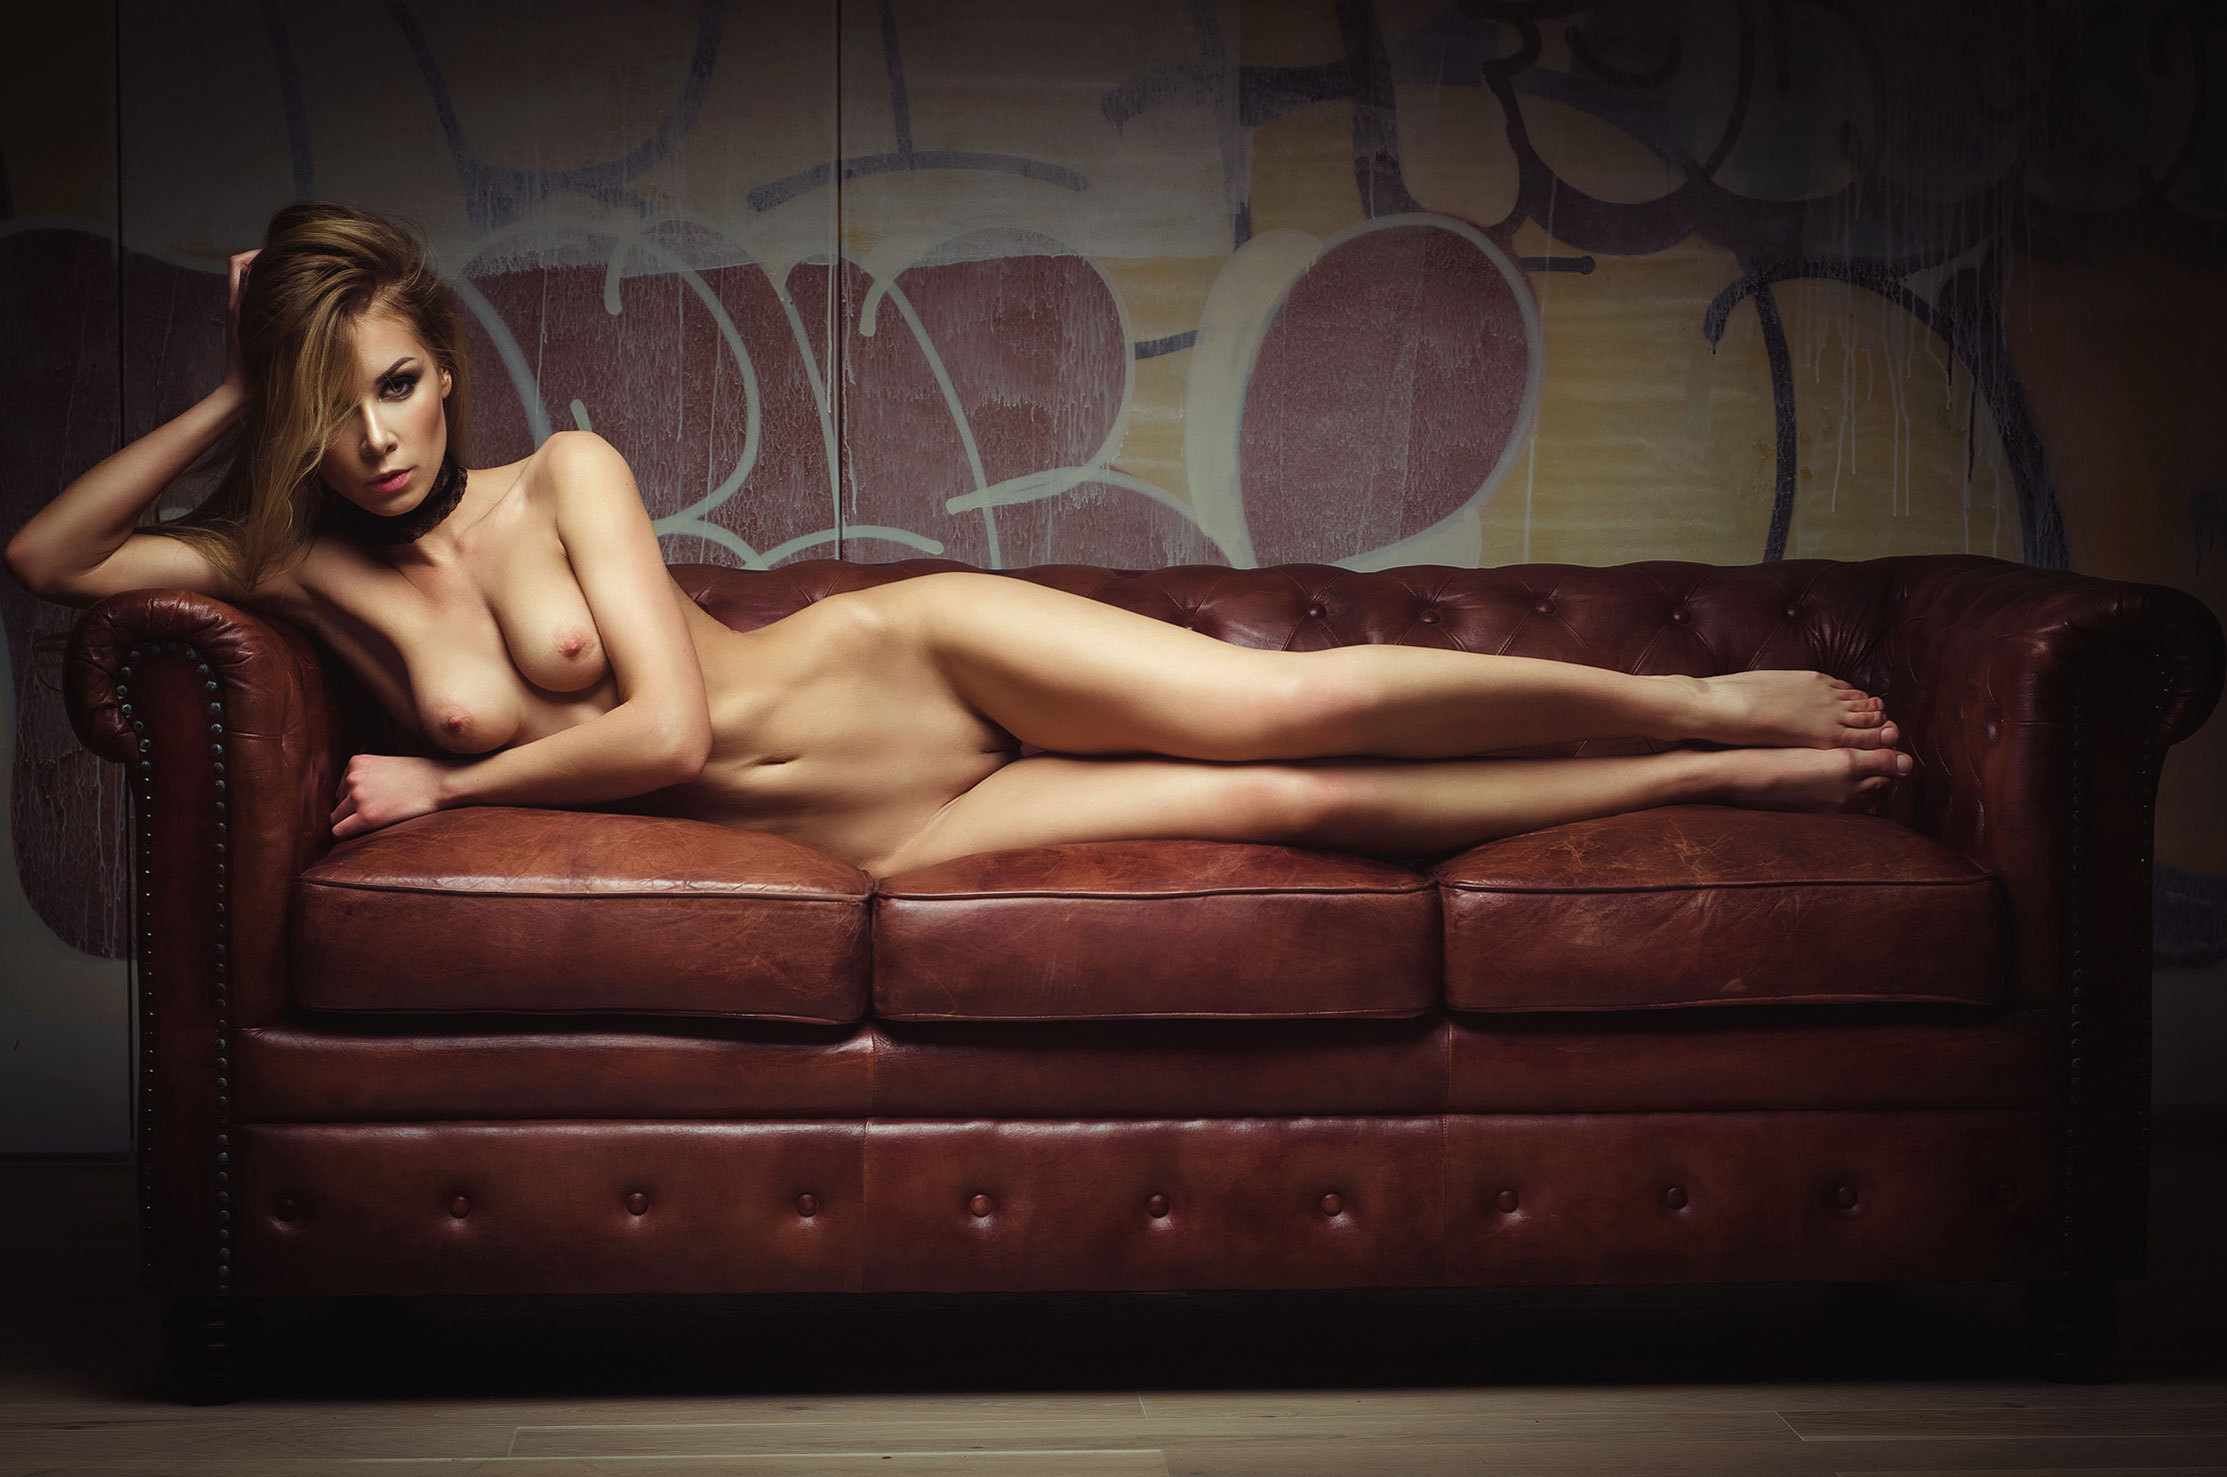 Yasia Yasina - Nikolas Verano photoshoot